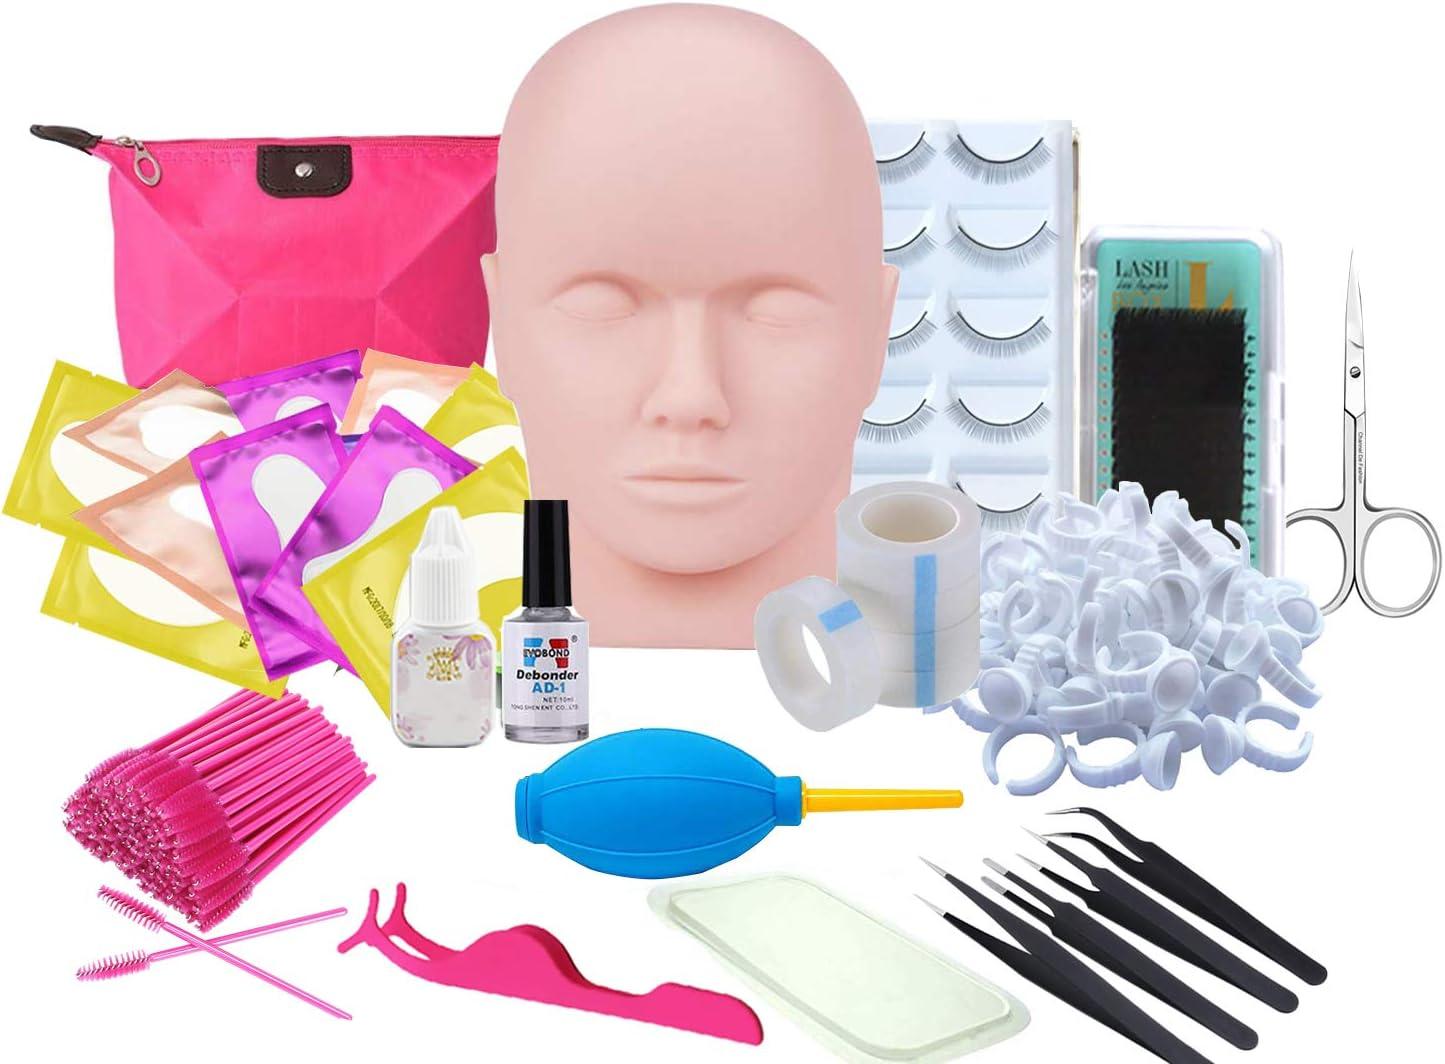 Kit Extensiones de Pestañas, Missicee kit Extension de Pestañas Postizas Extensión Entrenamiento Herramienta de Maquillaje, Kit de Práctica con Bolsa (20pcs)